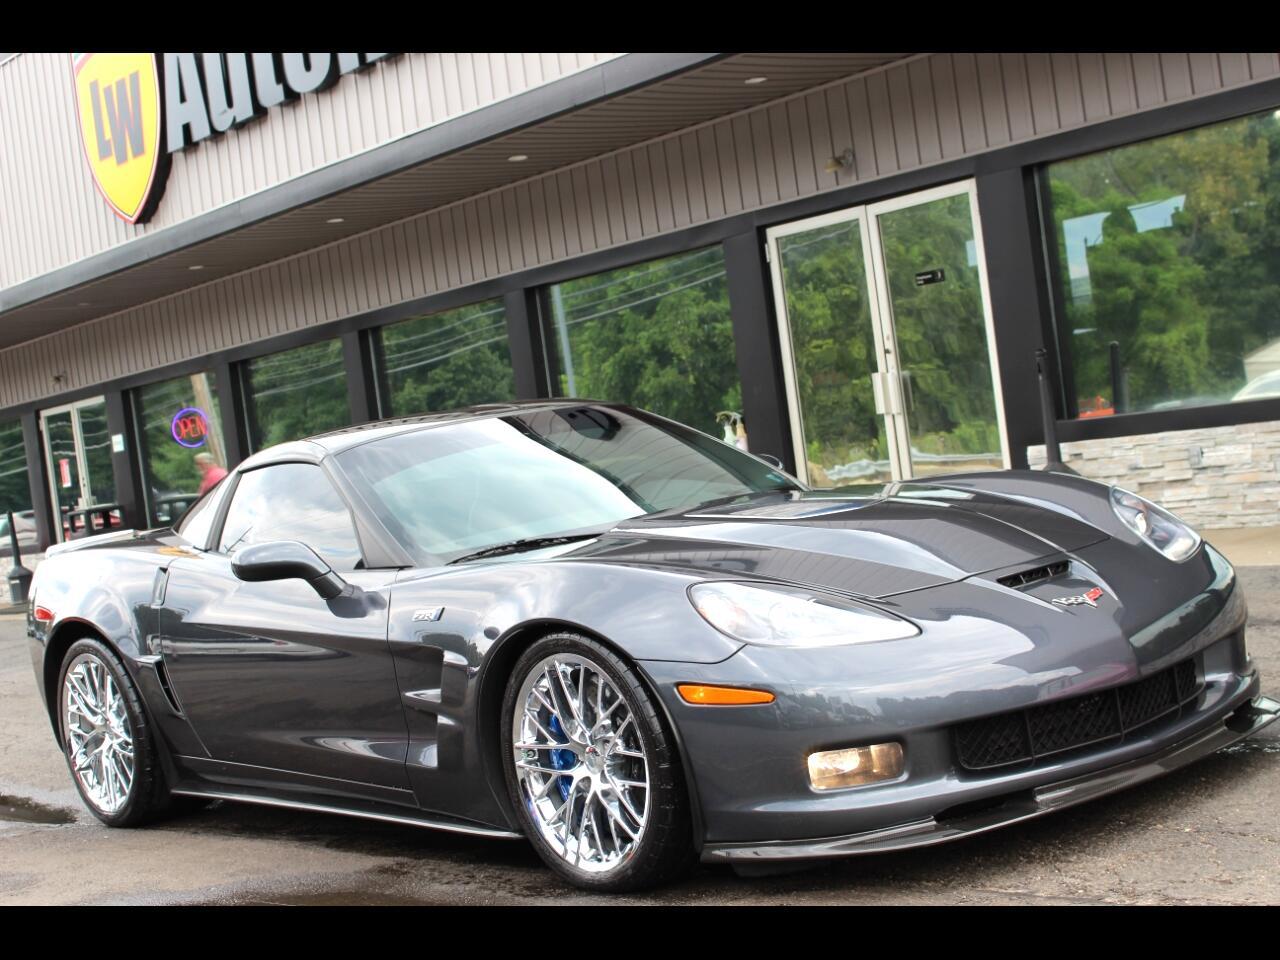 2010 Chevrolet Corvette 2dr Cpe ZR1 w/3ZR